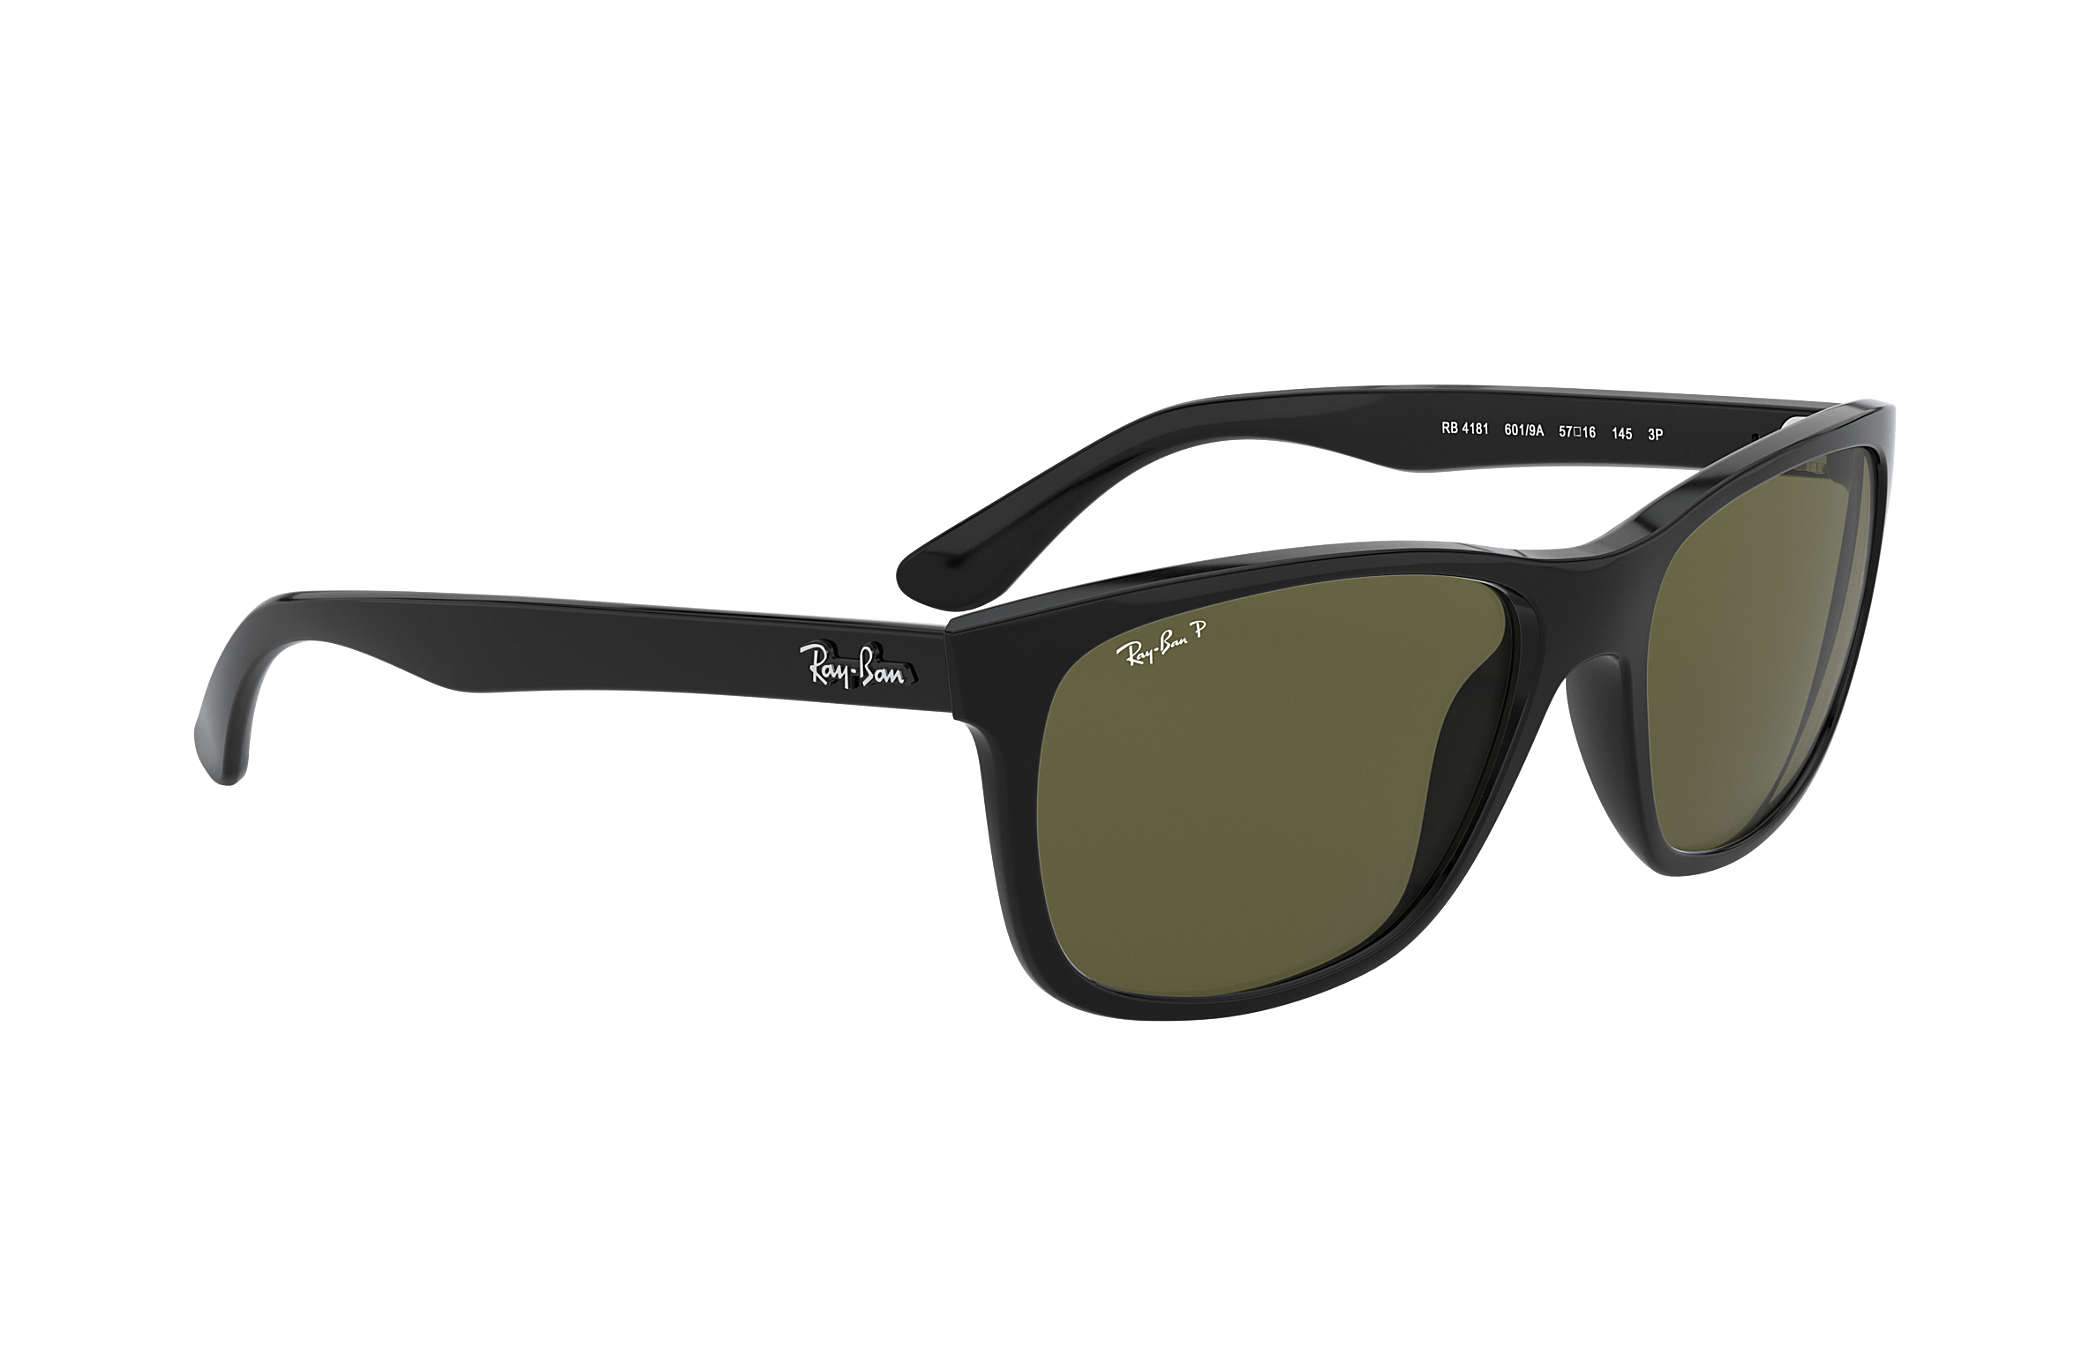 7fe0127382b3 Ray-Ban RB4181 Black - Nylon - Green Polarized Lenses - 0RB4181601 ...